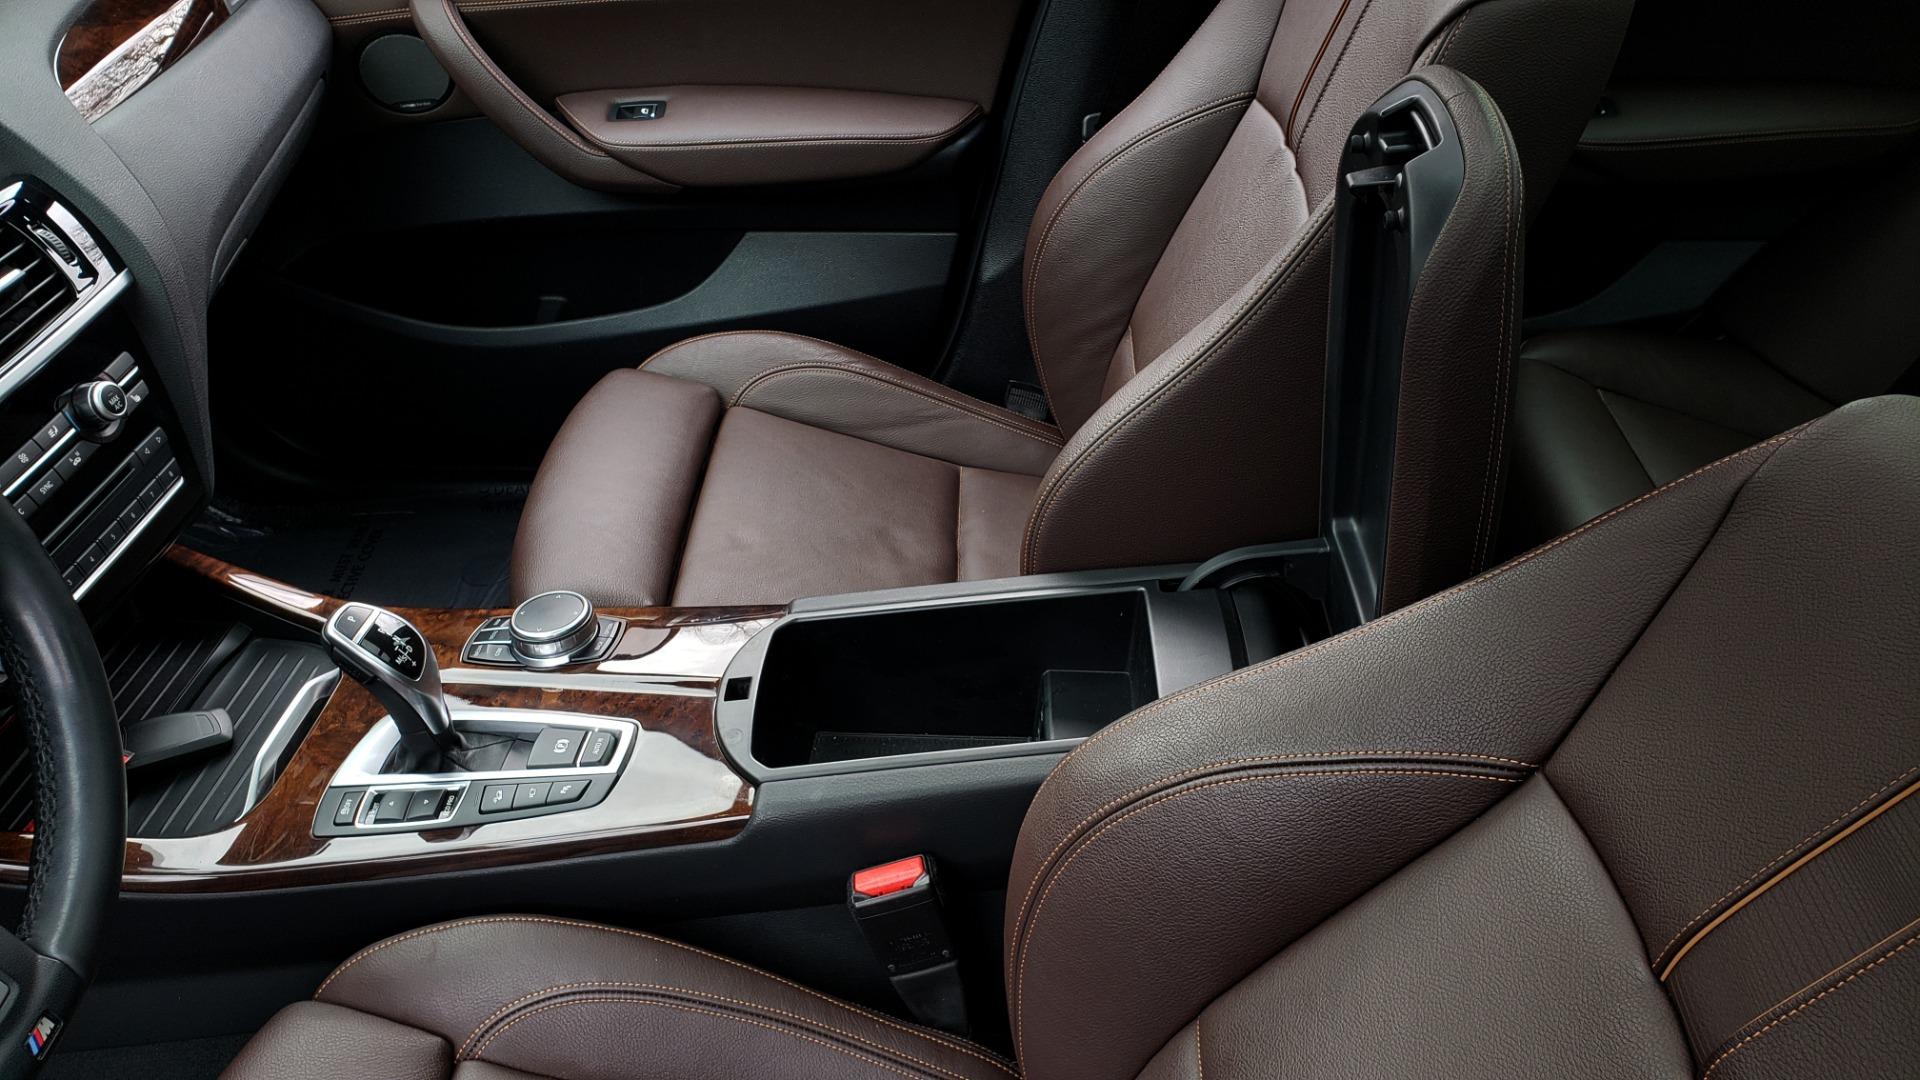 Used 2017 BMW X3 XDRIVE35I M-SPORT / DRVR ASST PLUS / TECHNOLOGY / HUD / BLIND SPOT for sale Sold at Formula Imports in Charlotte NC 28227 56